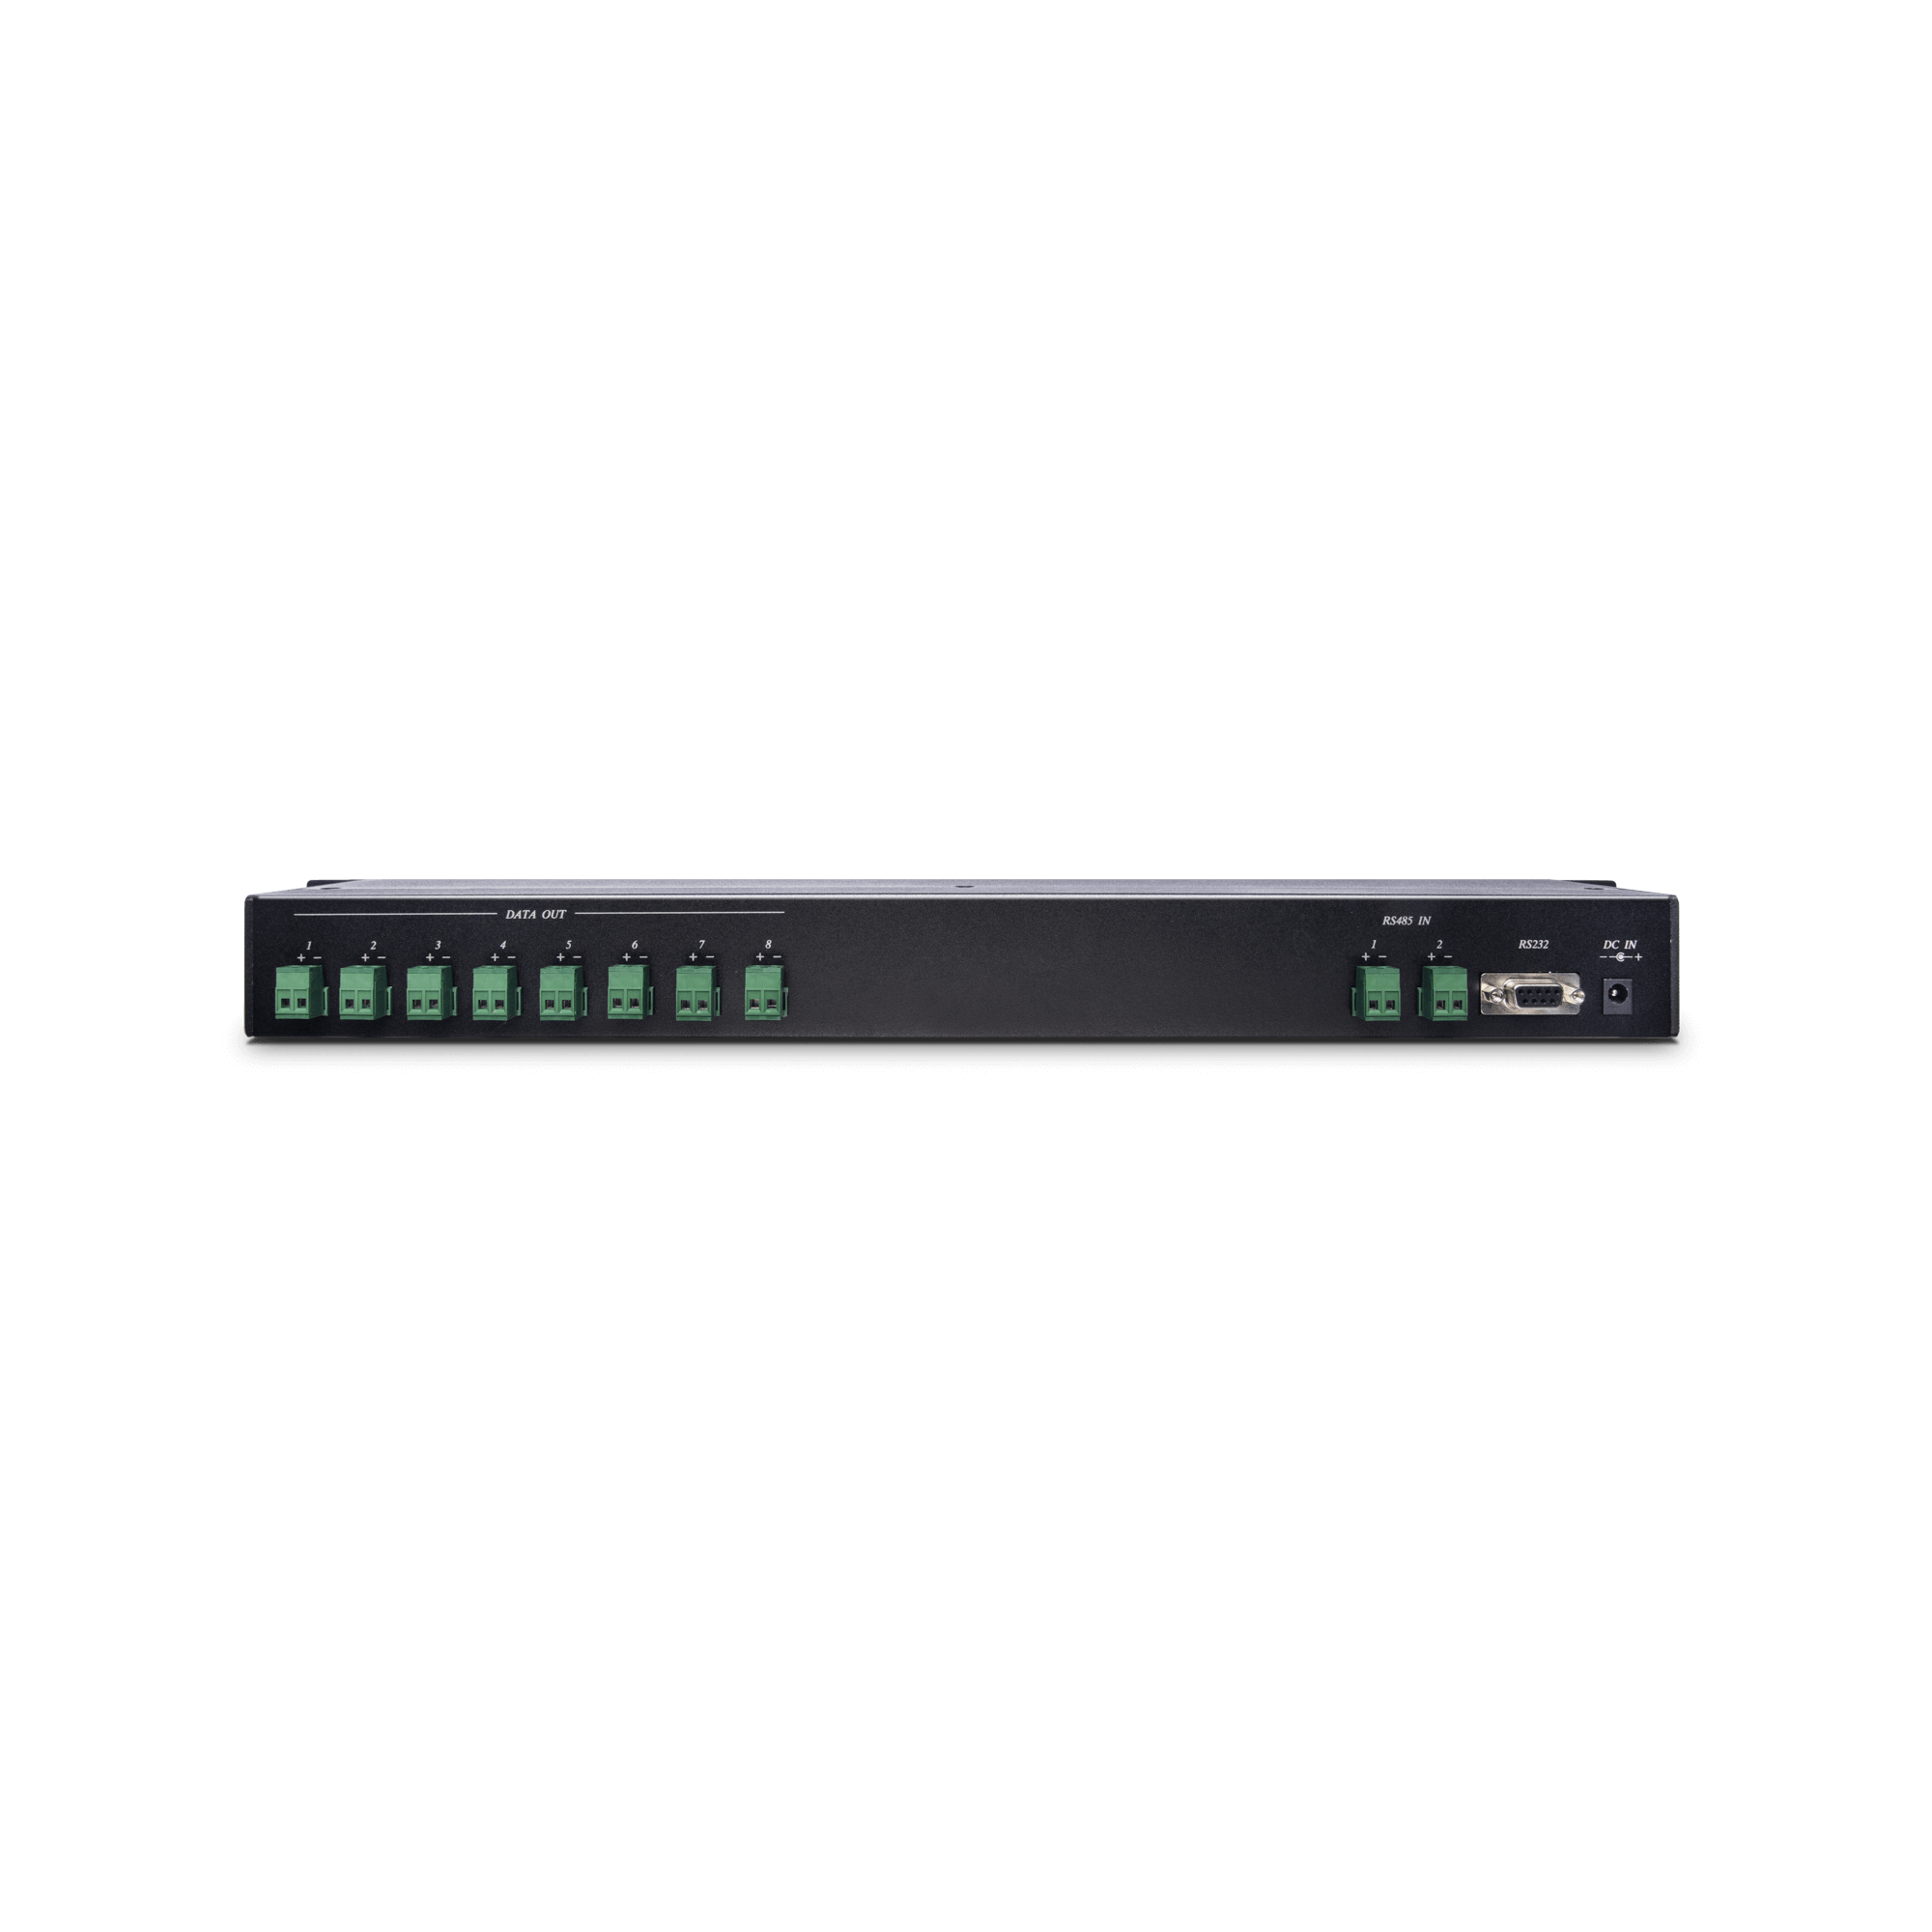 1 x 8 RS485 Serial Data Distributor in 1U Rack